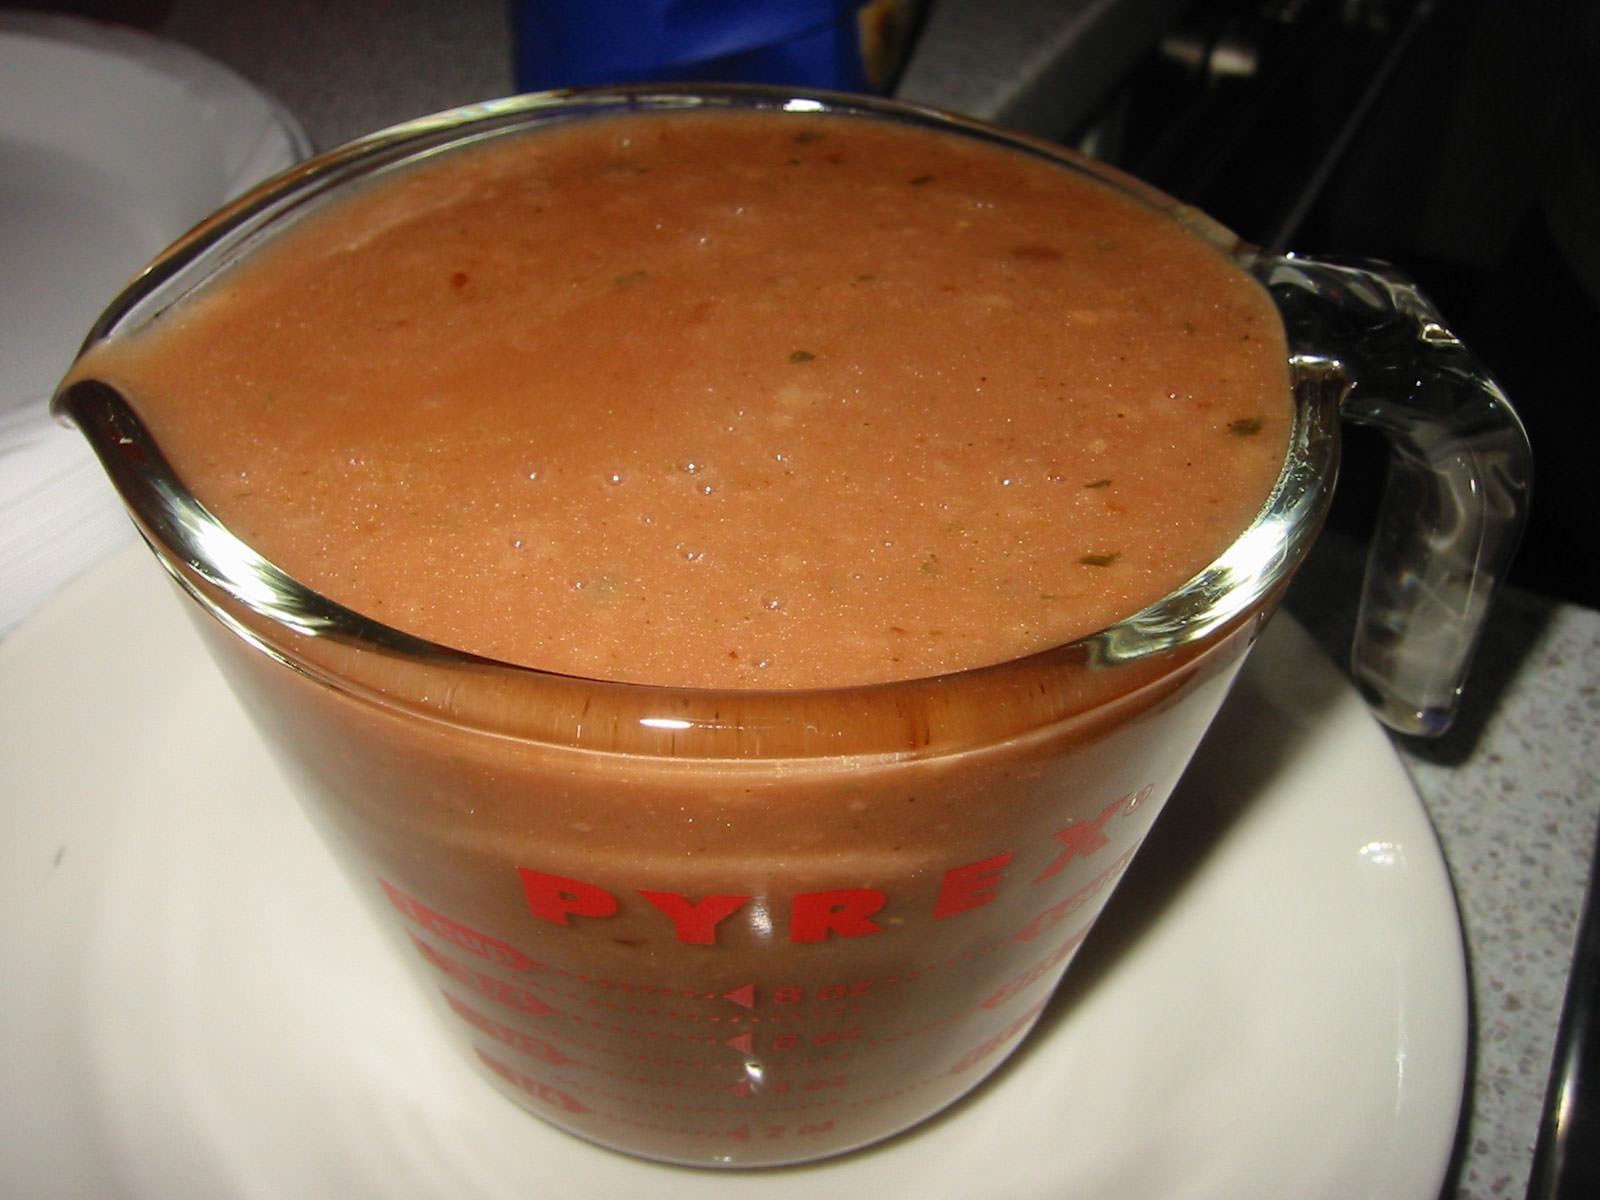 That's a jug full of gravy!